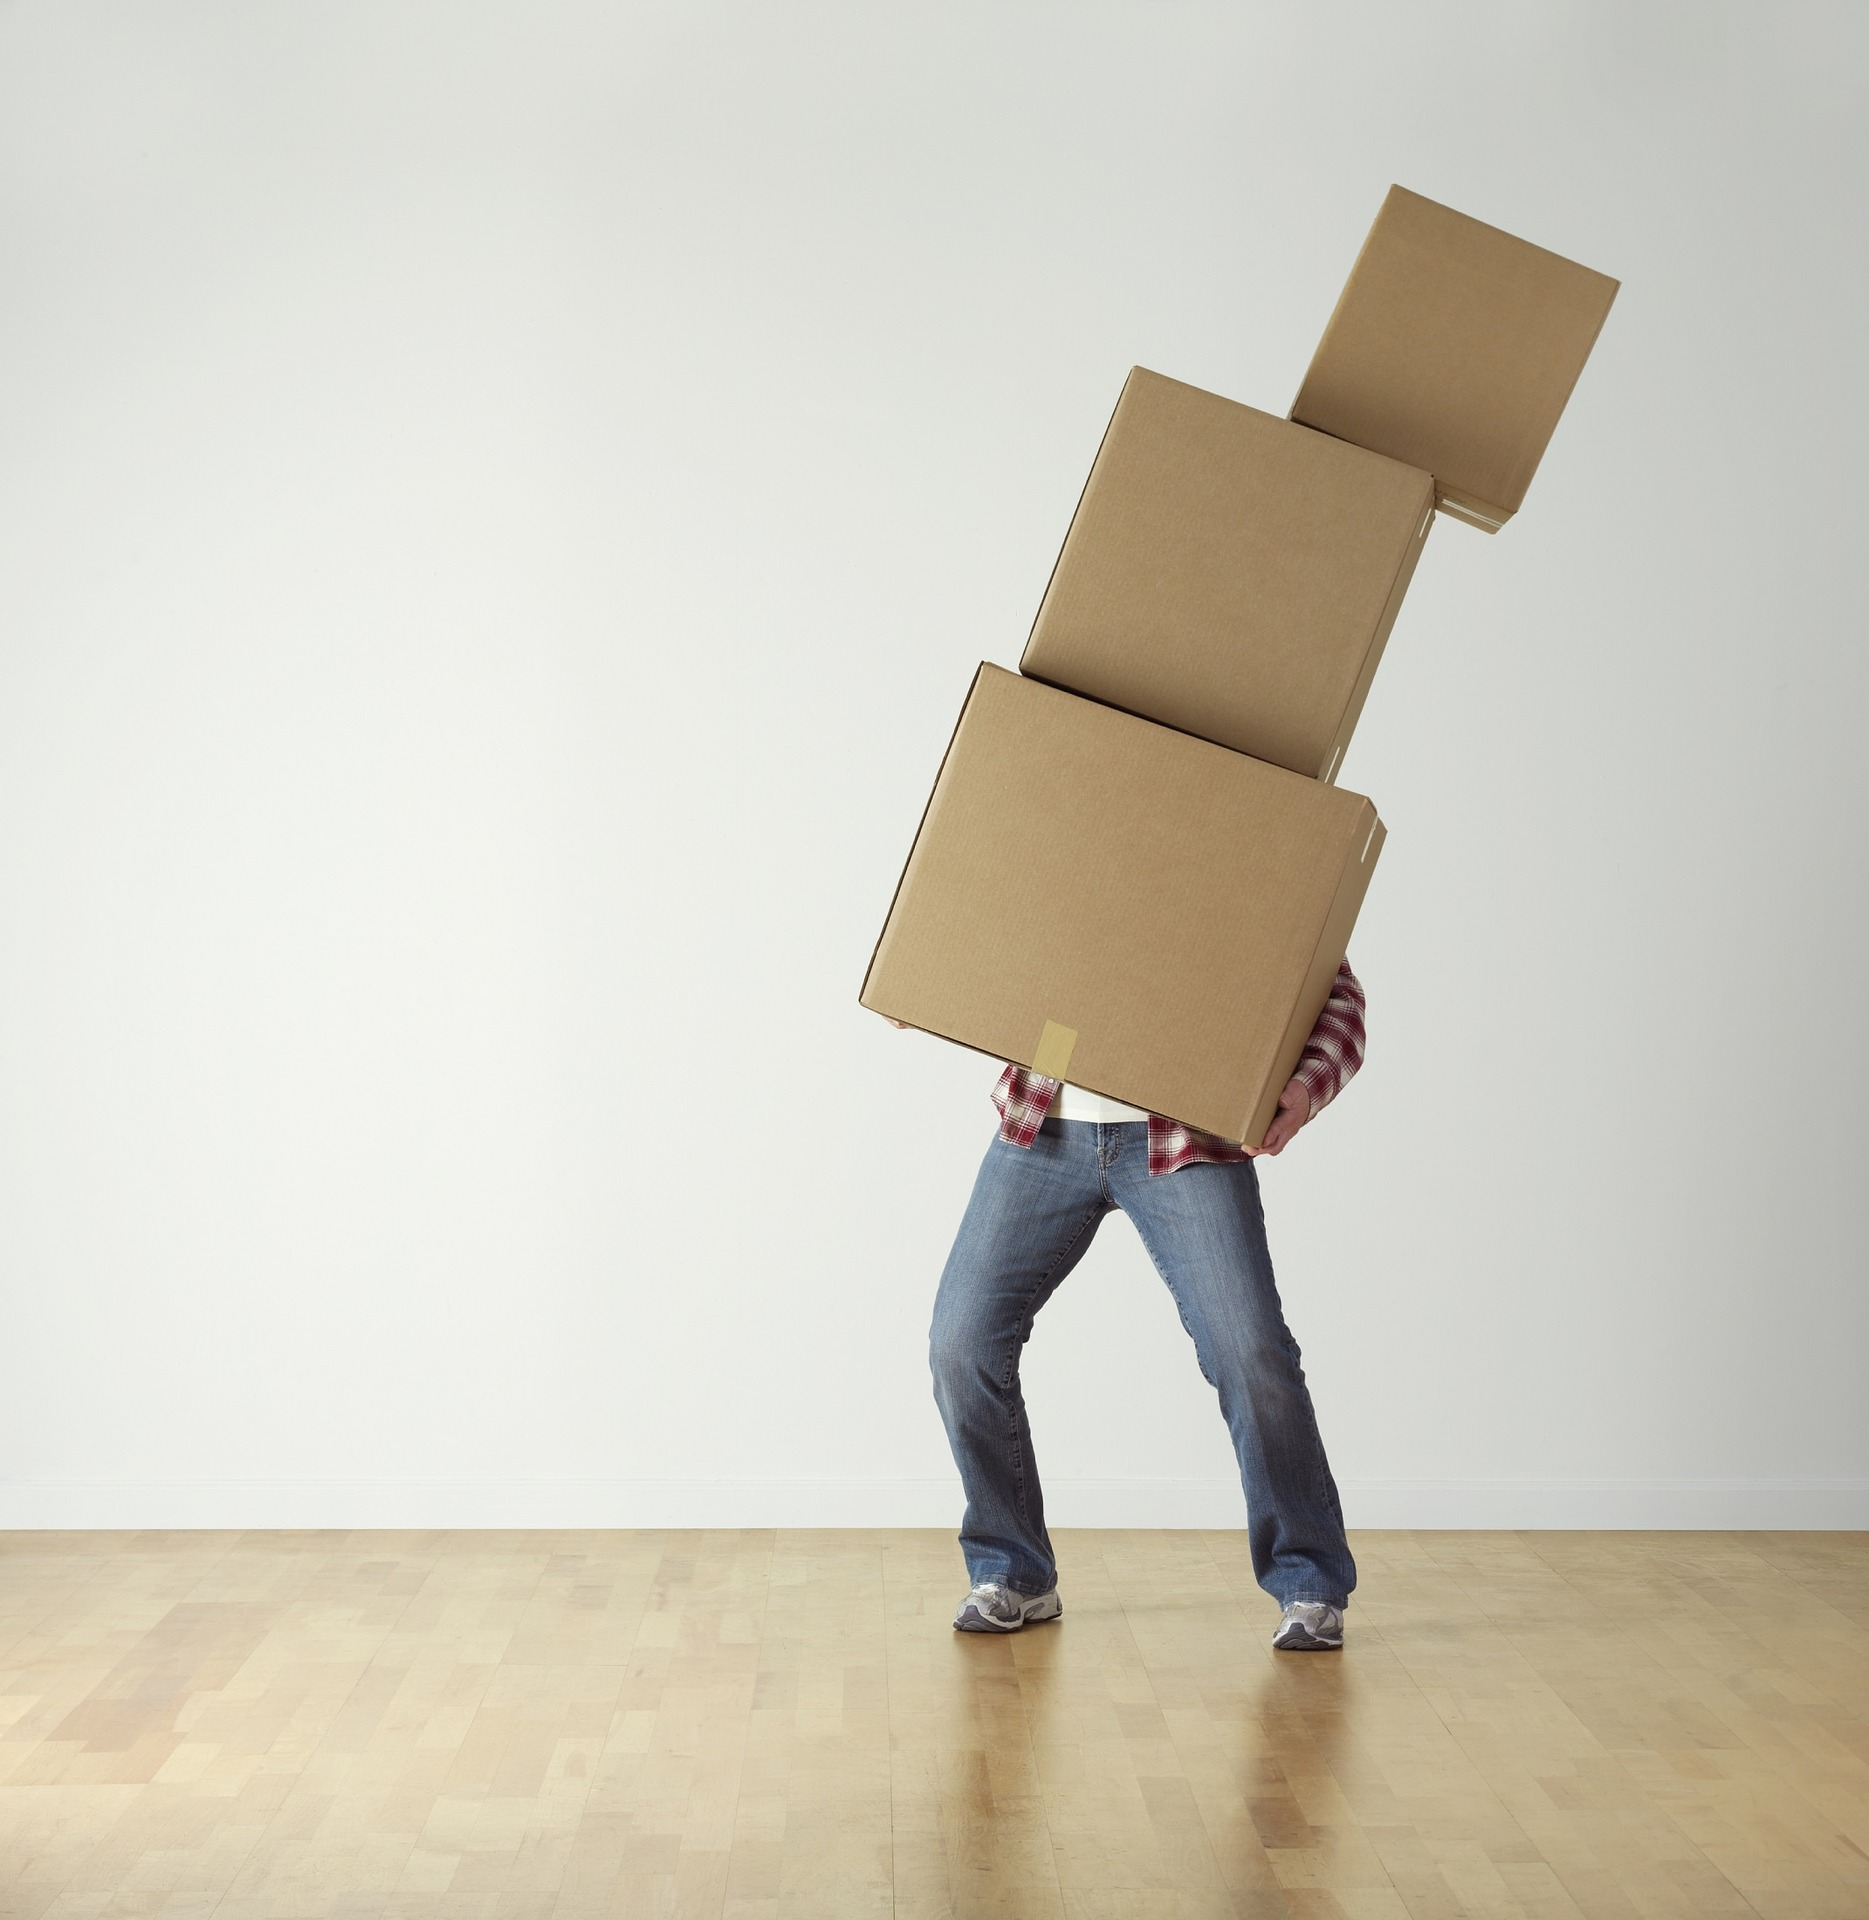 boxes-2624231_1920